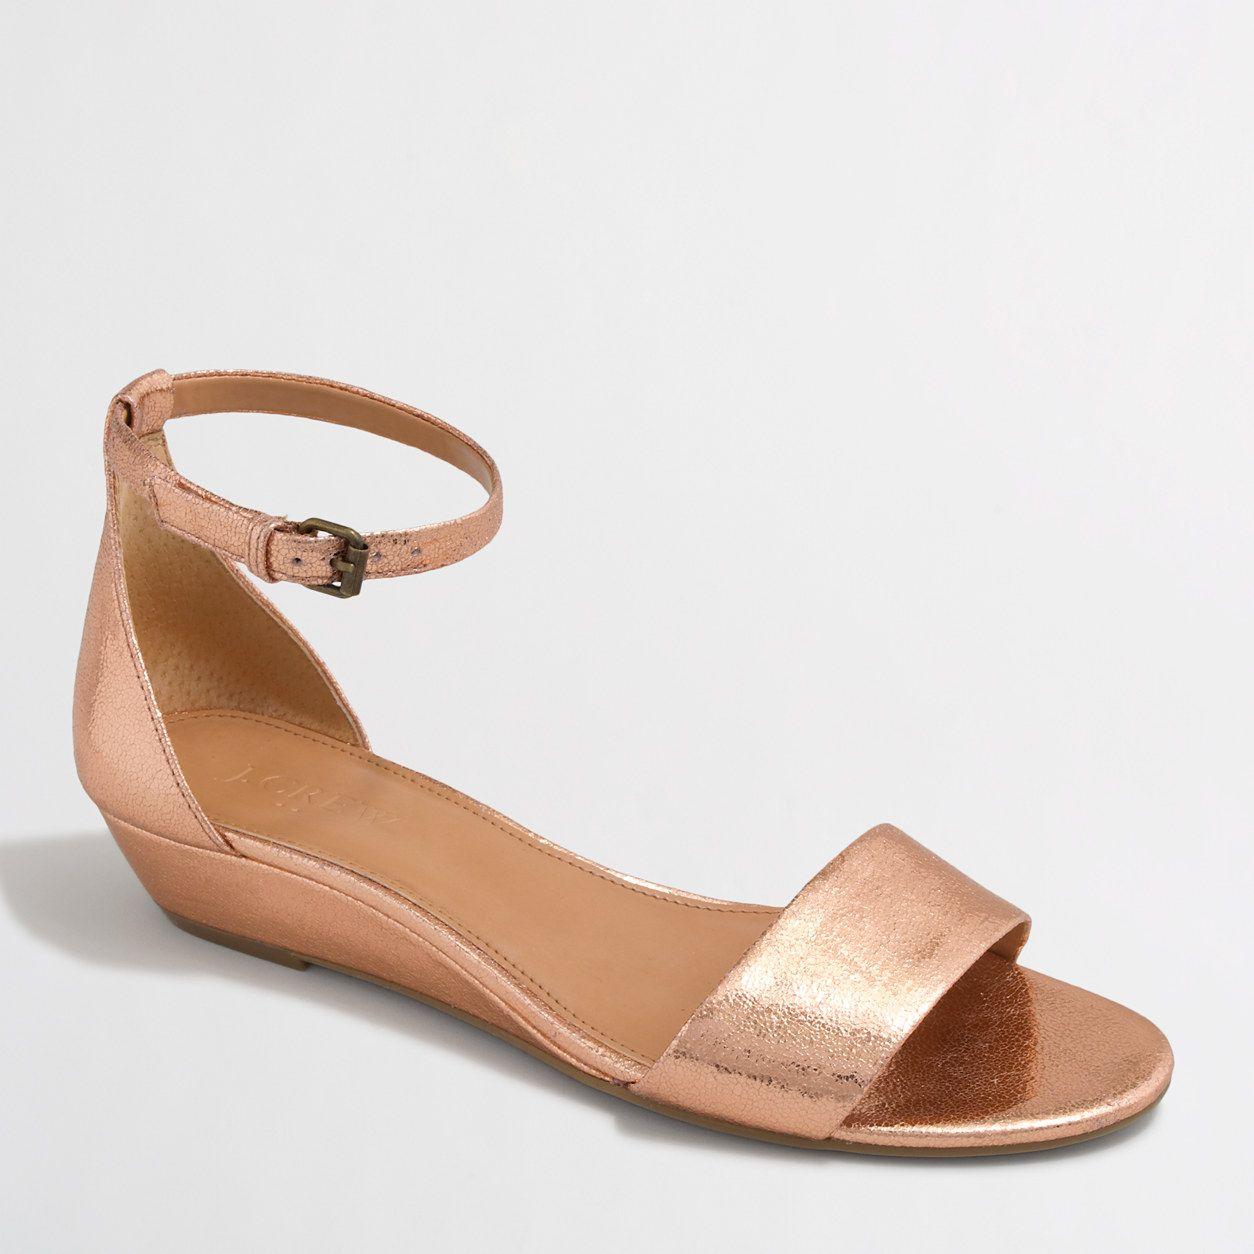 e26e3bf4b9f Factory crackle demi-wedge sandals   Sandals